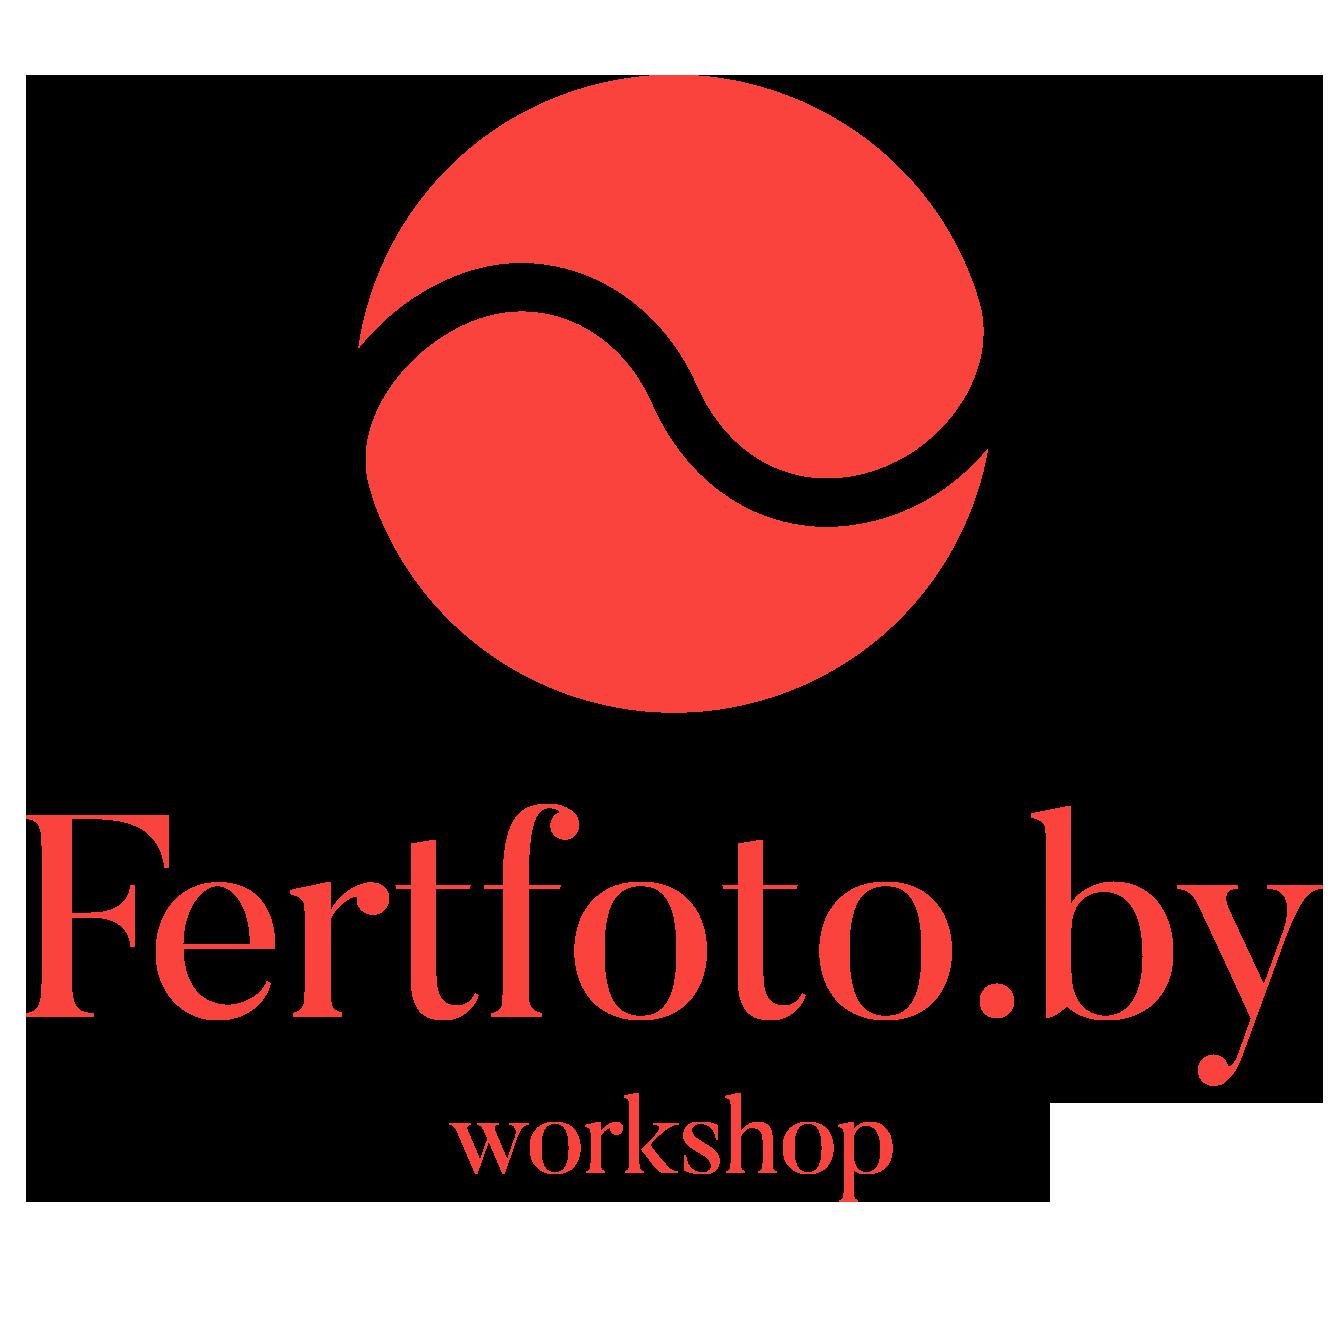 fertfoto.by